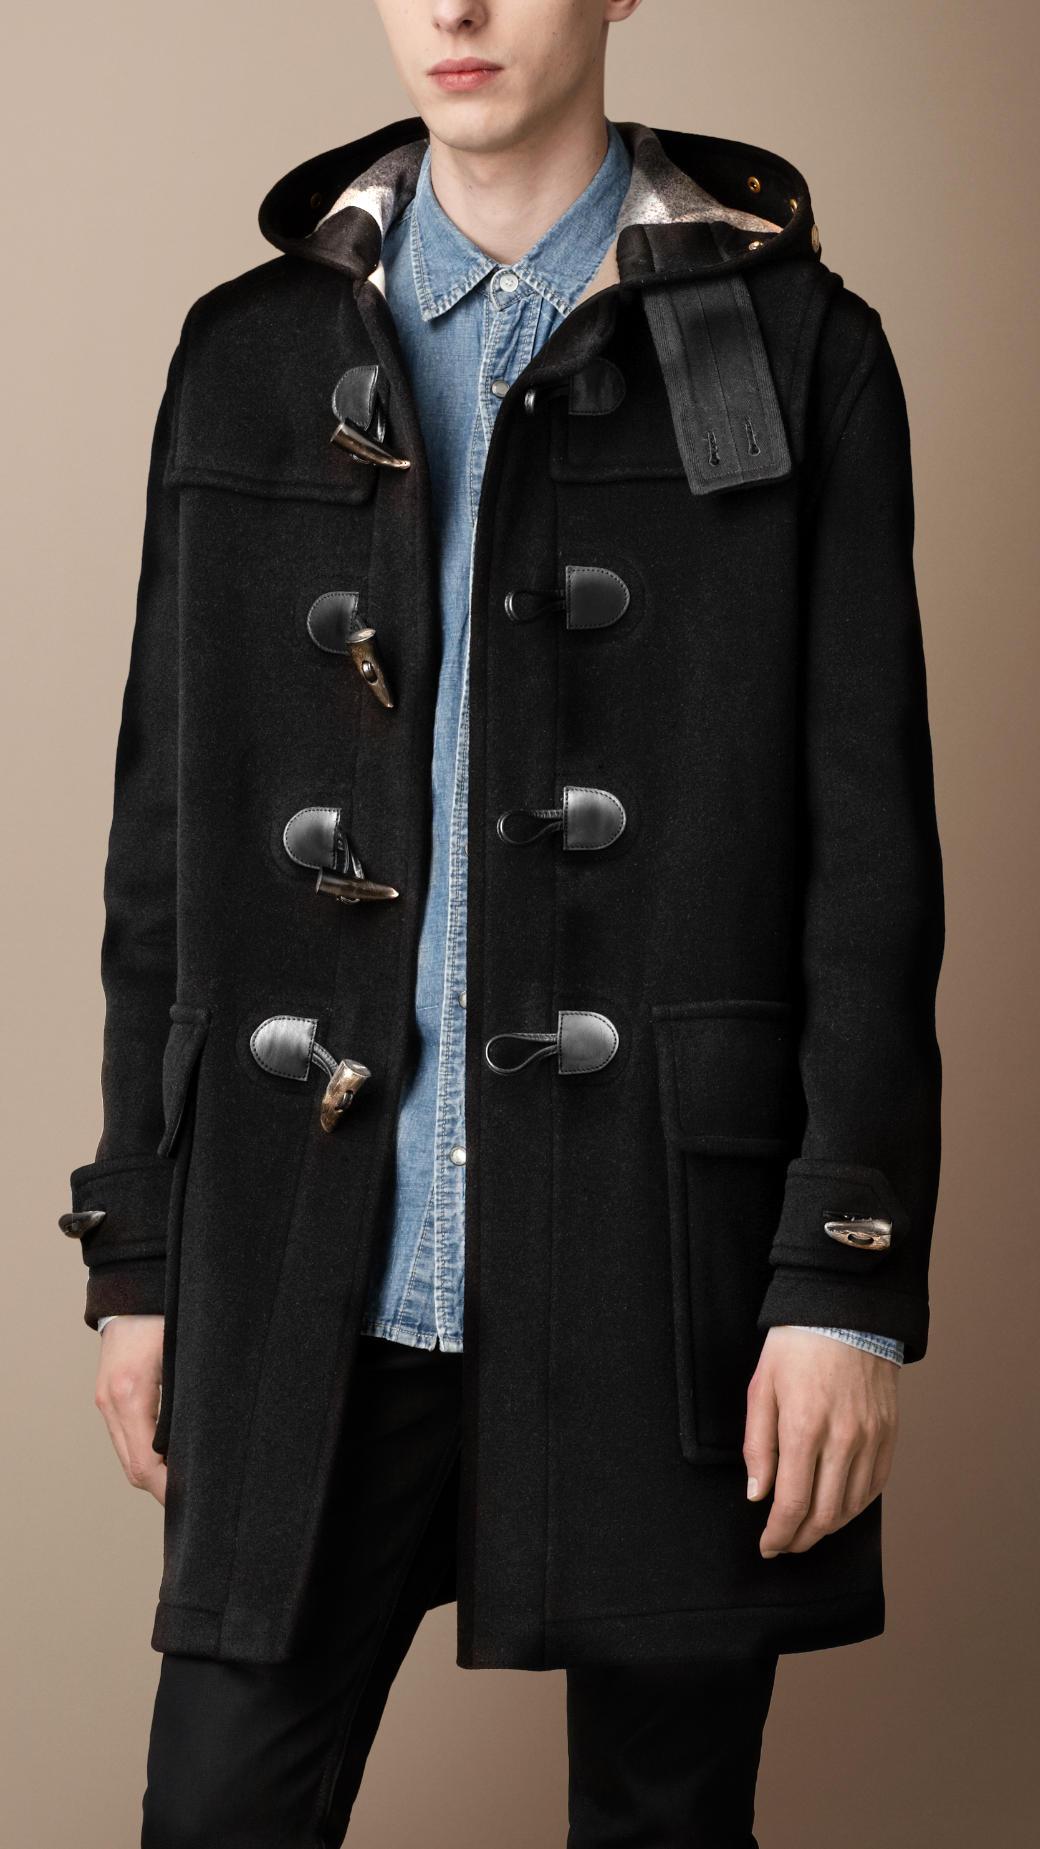 burberry doublefaced wool duffle coat in black for men lyst. Black Bedroom Furniture Sets. Home Design Ideas